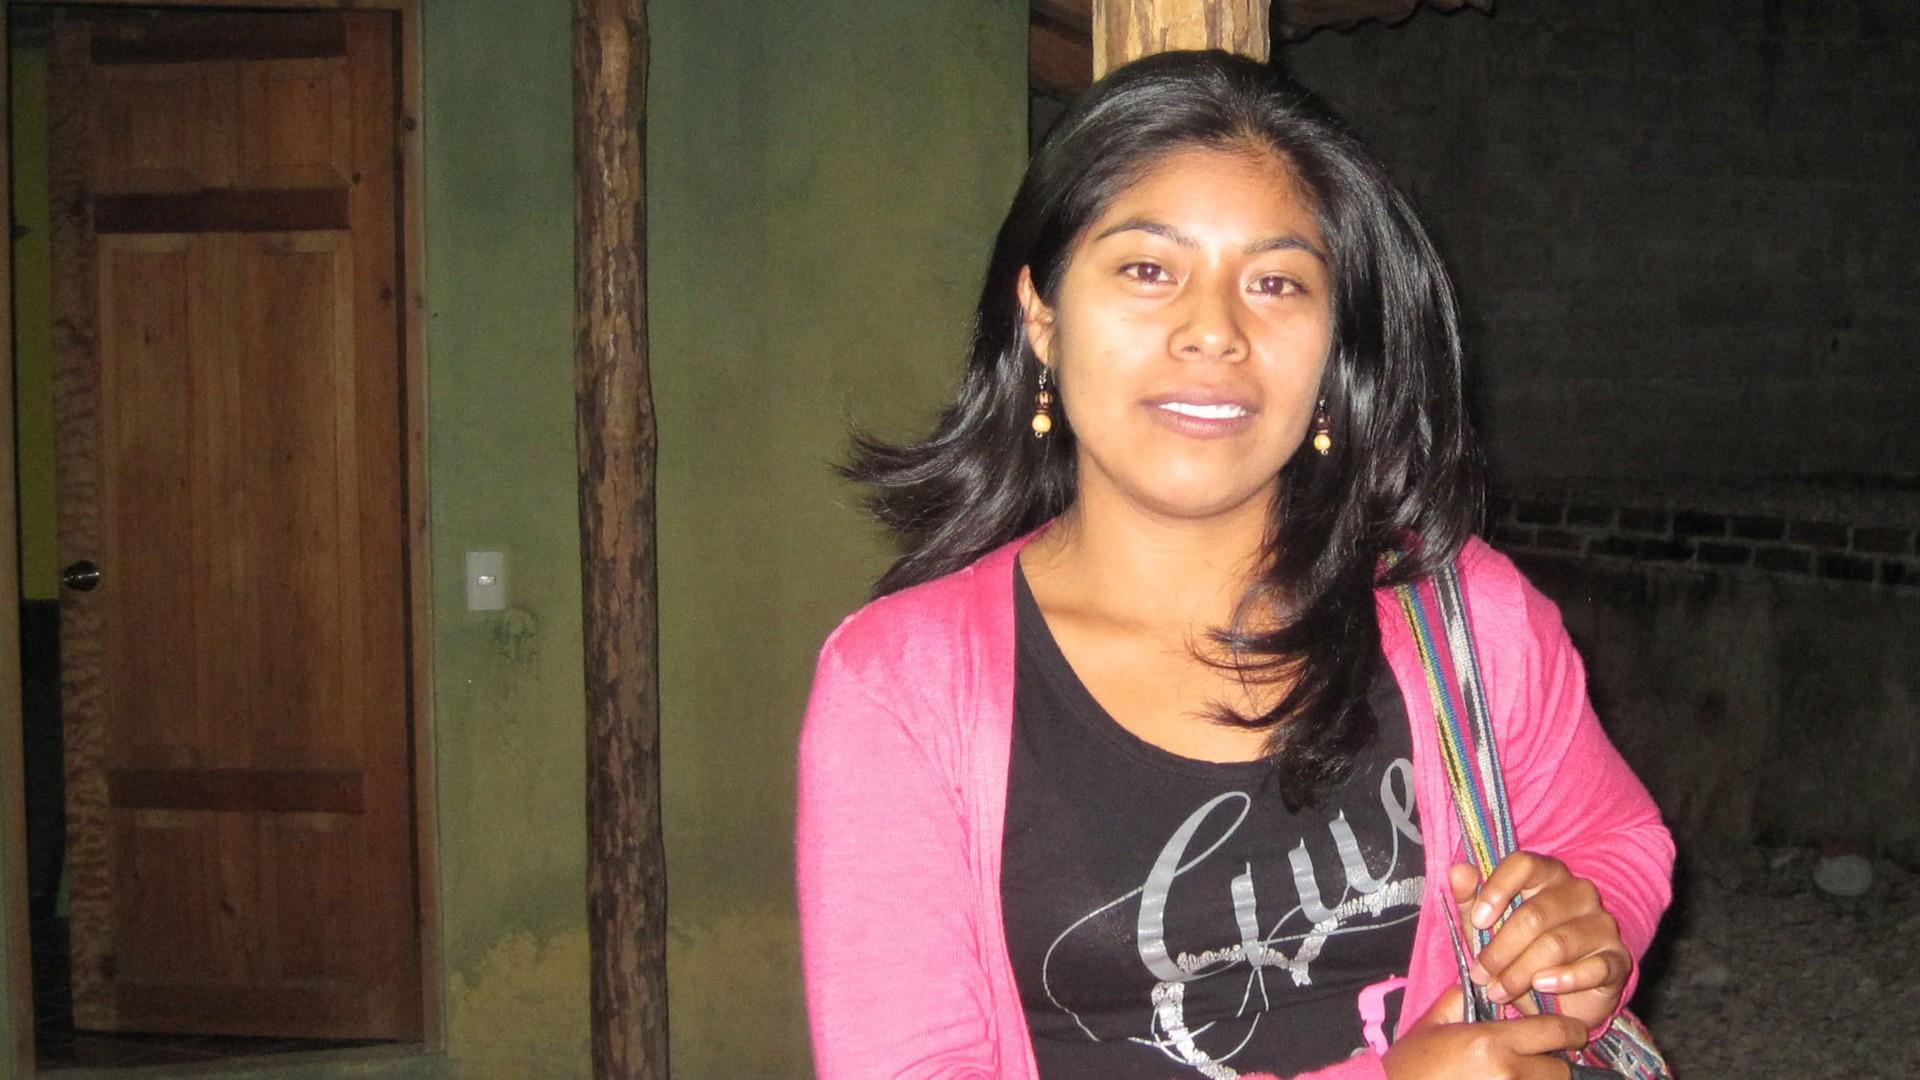 hollis center hispanic single women .